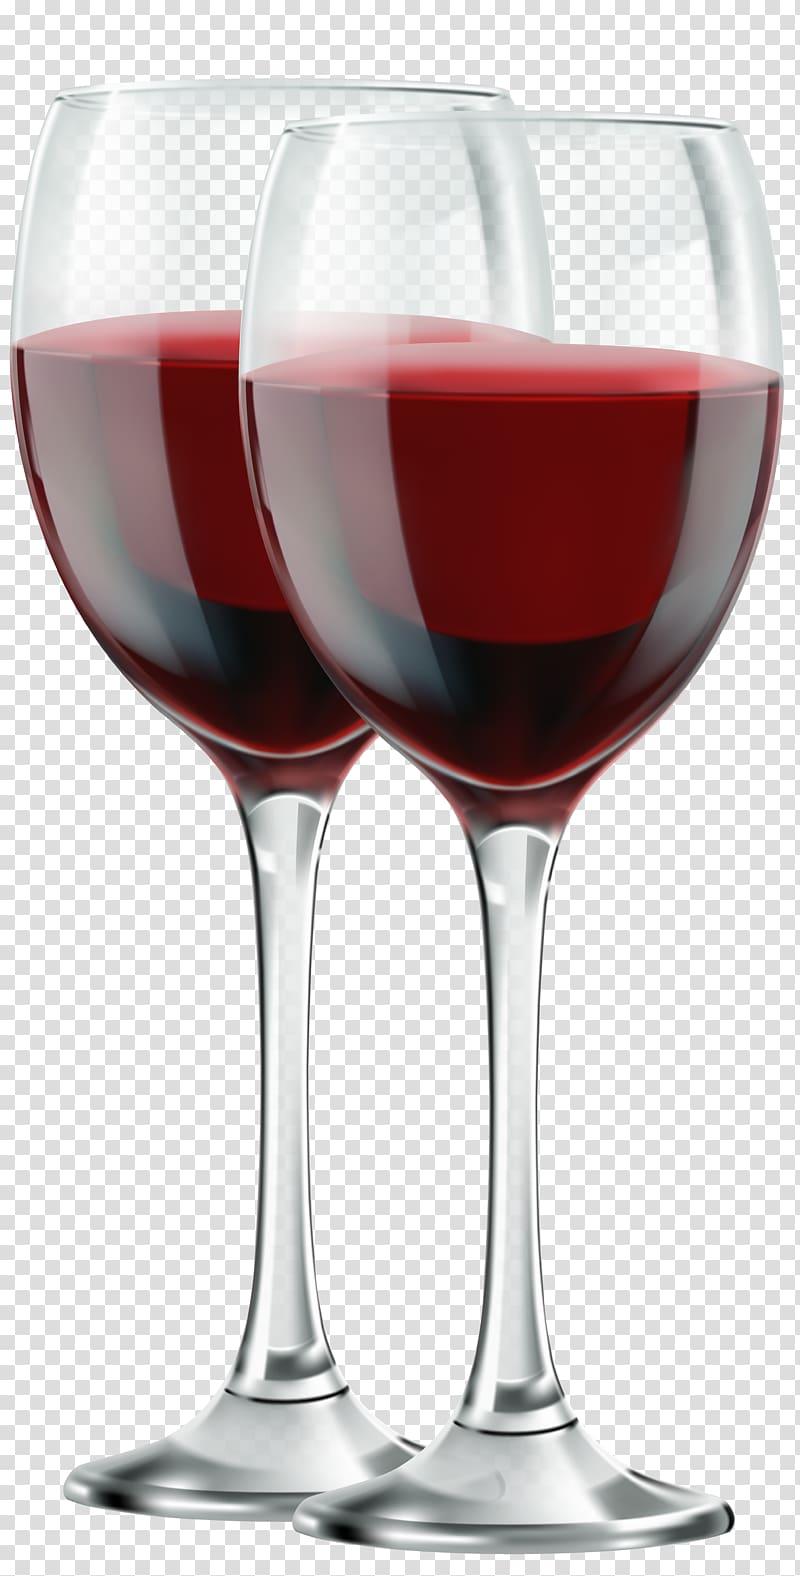 Wine glass half full clipart clip art free library Half-full wine cups, Red Wine Cabernet Sauvignon Champagne ... clip art free library